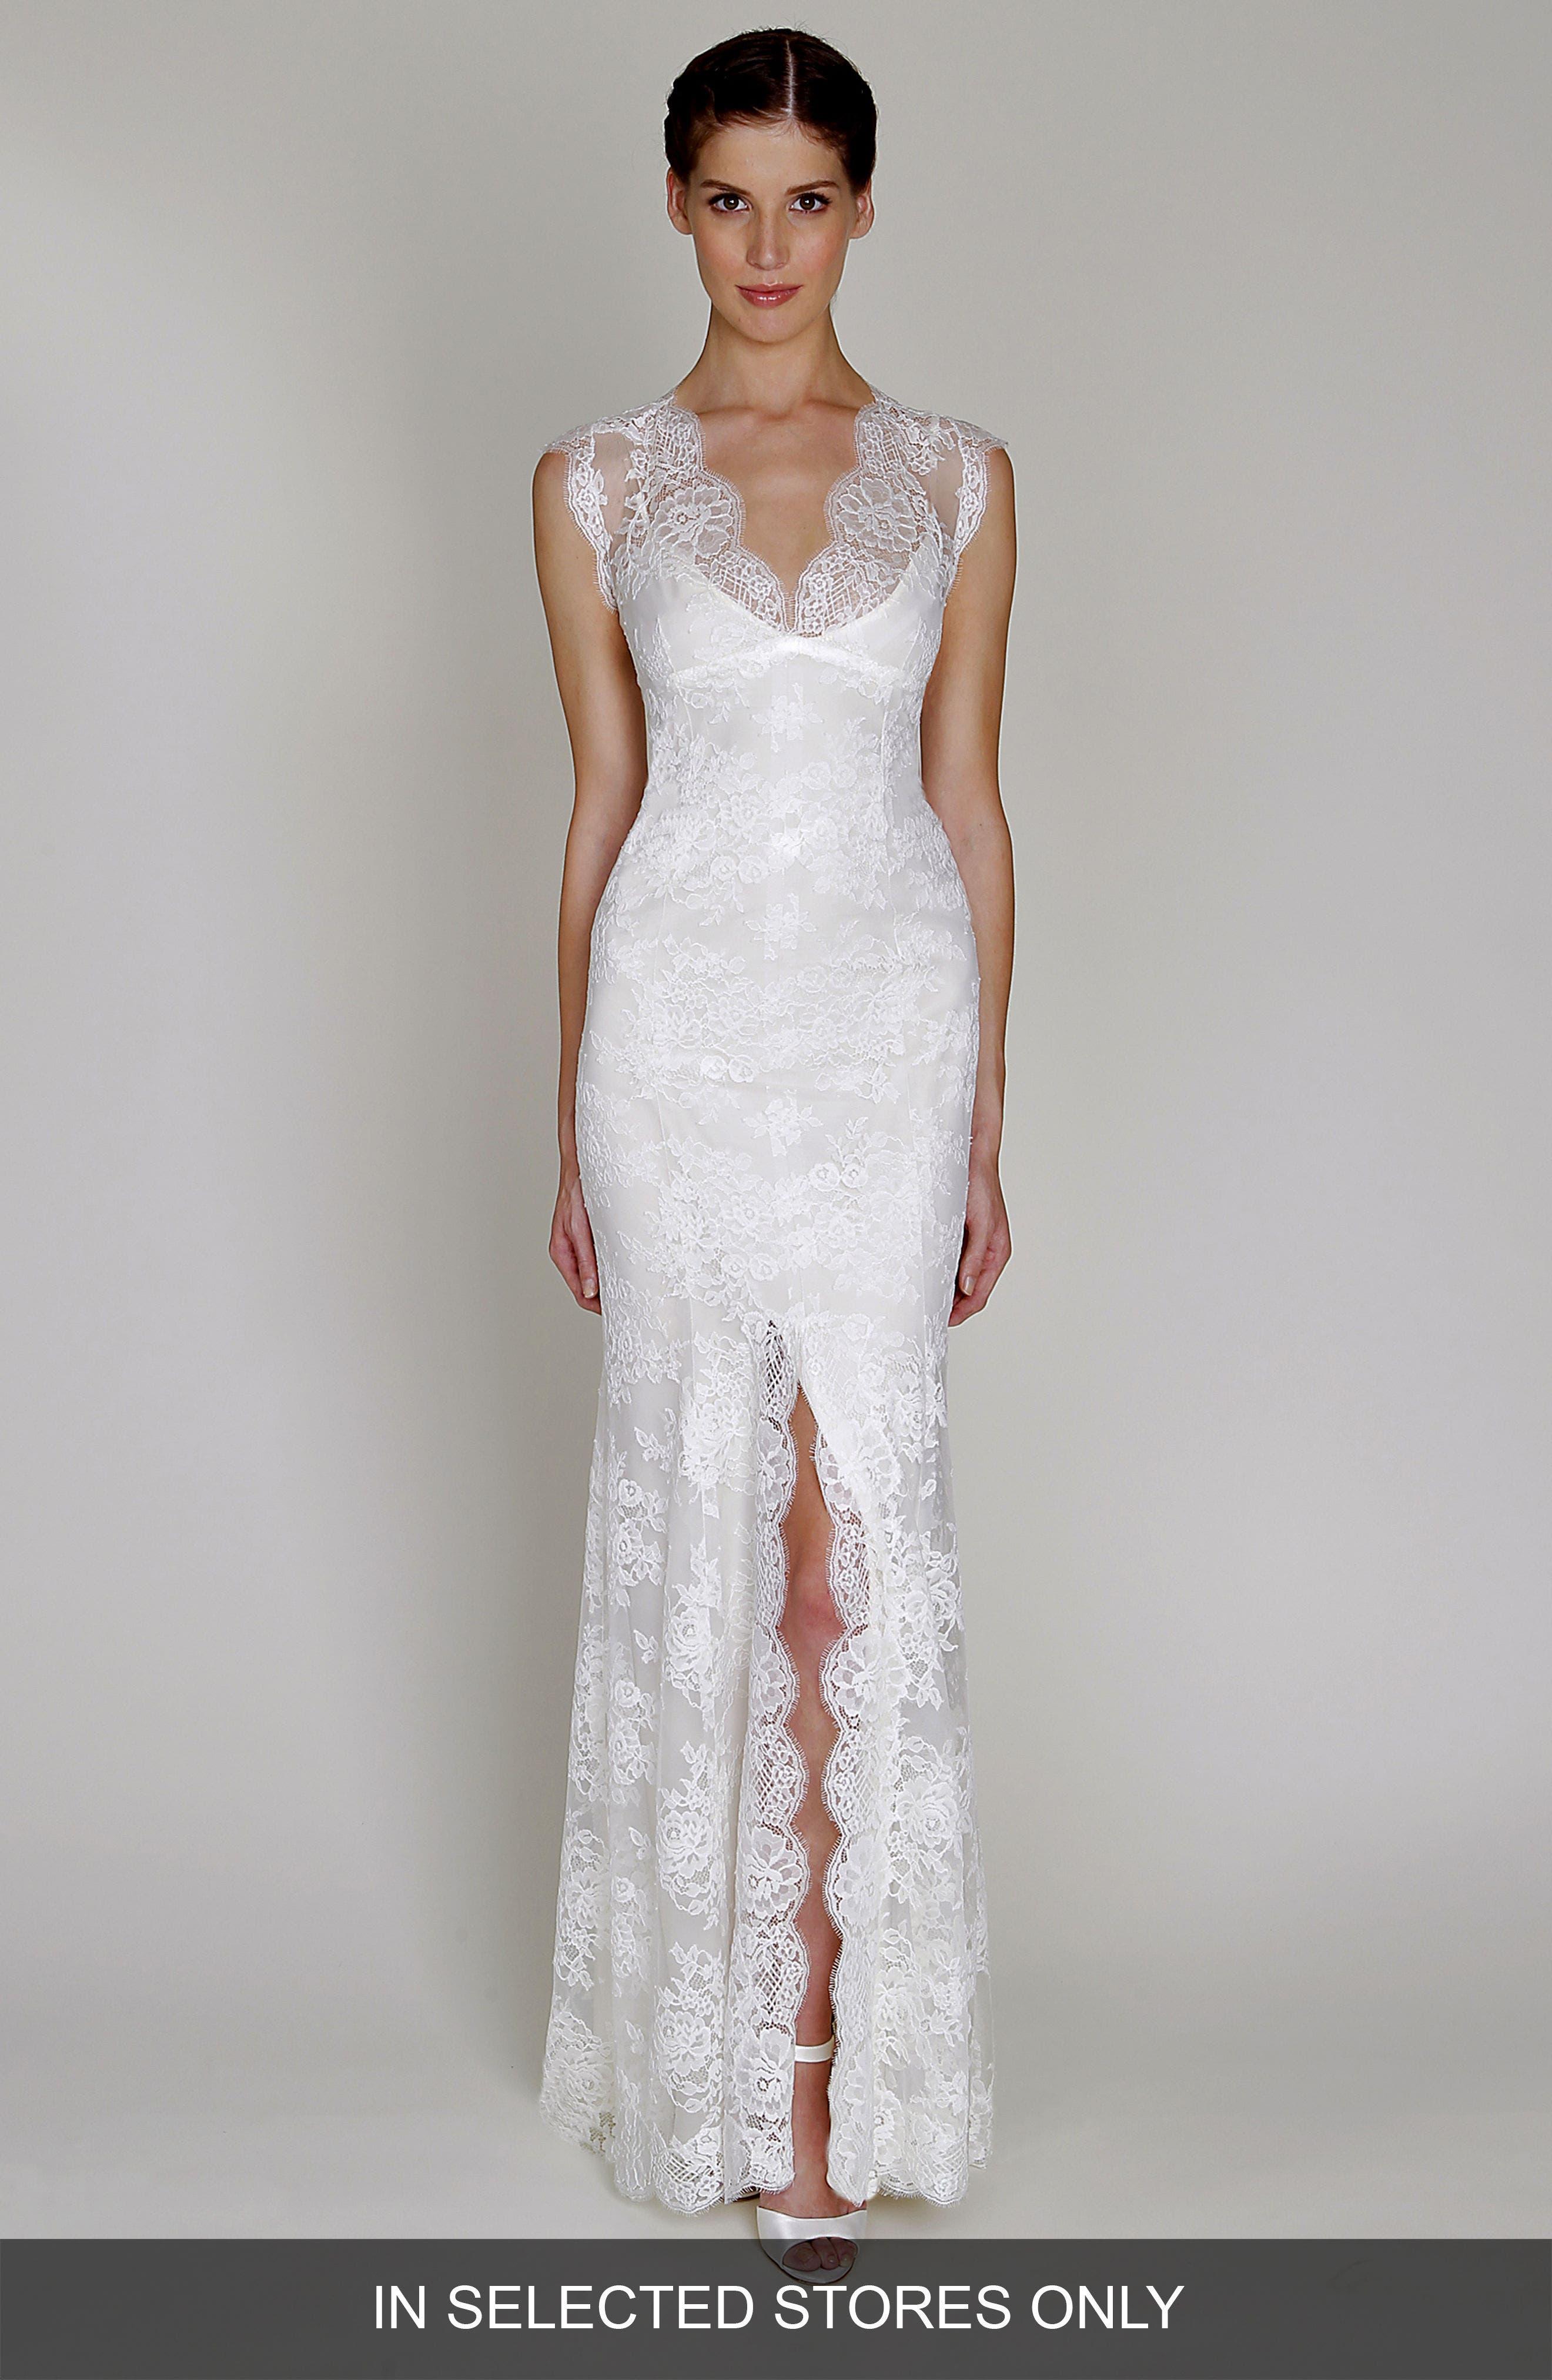 BLISS Monique Lhuillier Chantilly Lace Open Back Wedding Dress